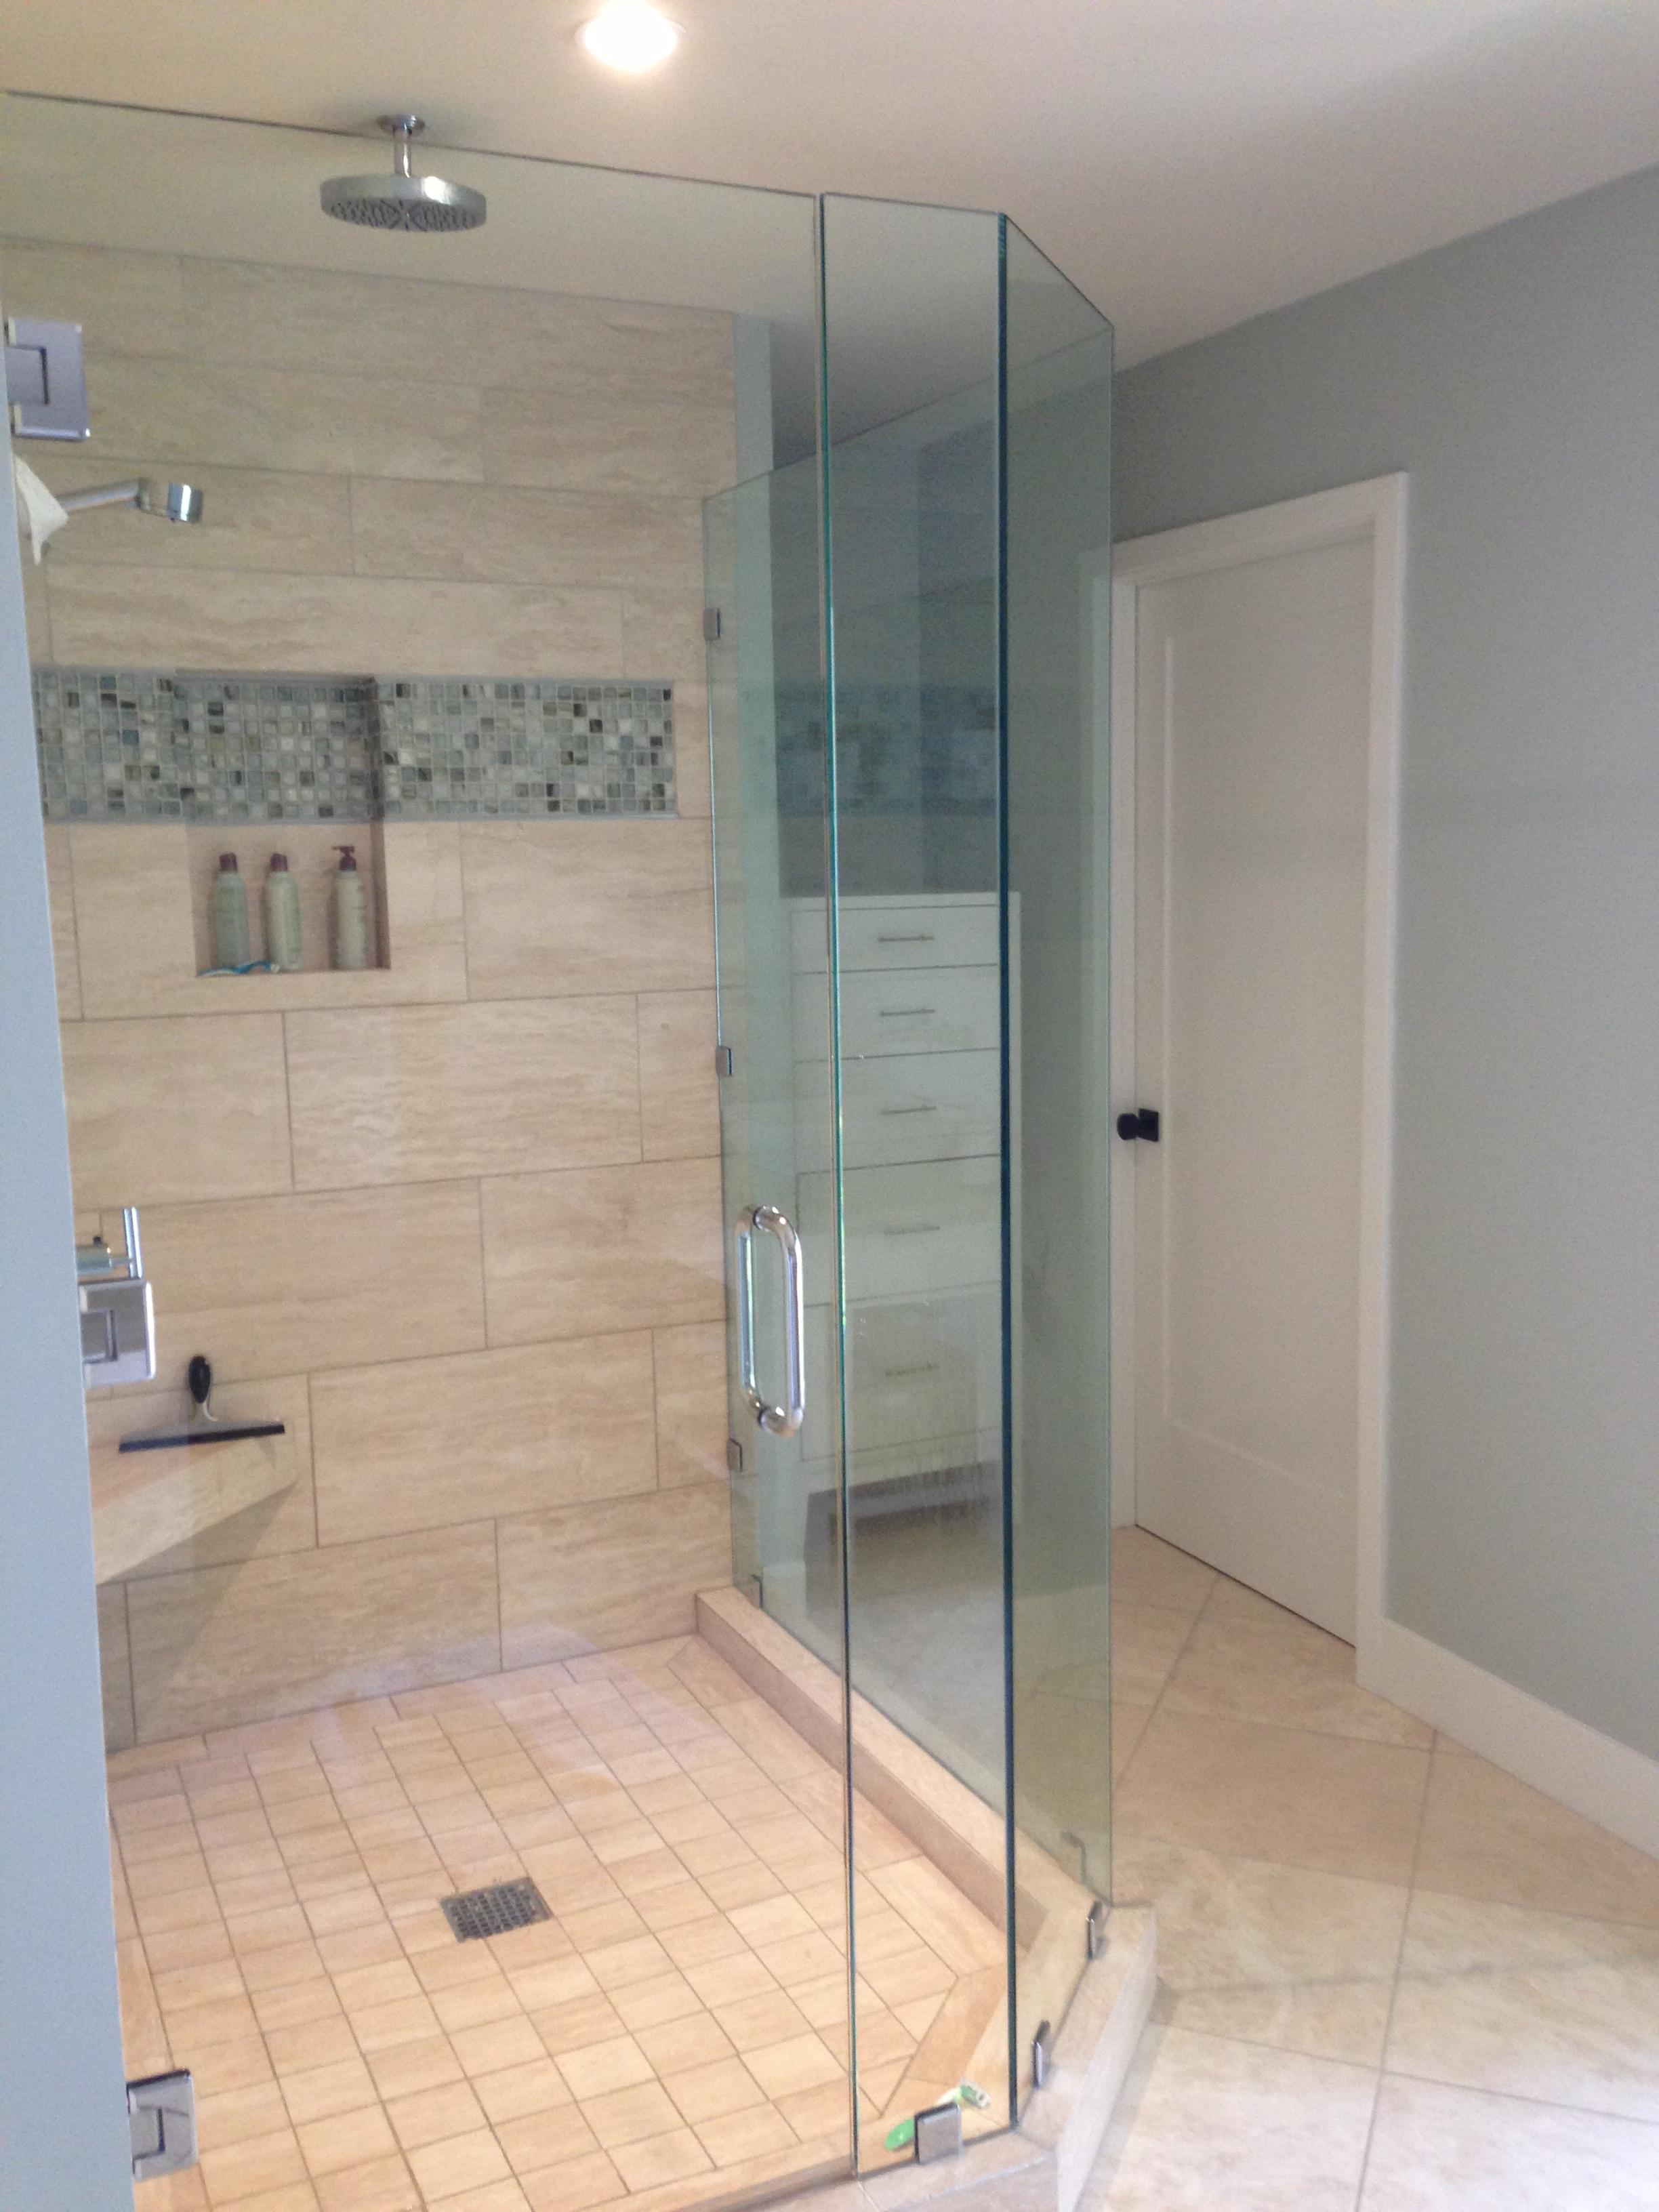 Master shower Lunada Bay Sumi-E glass tile Walker Zanger - Ventura California rental house review tour